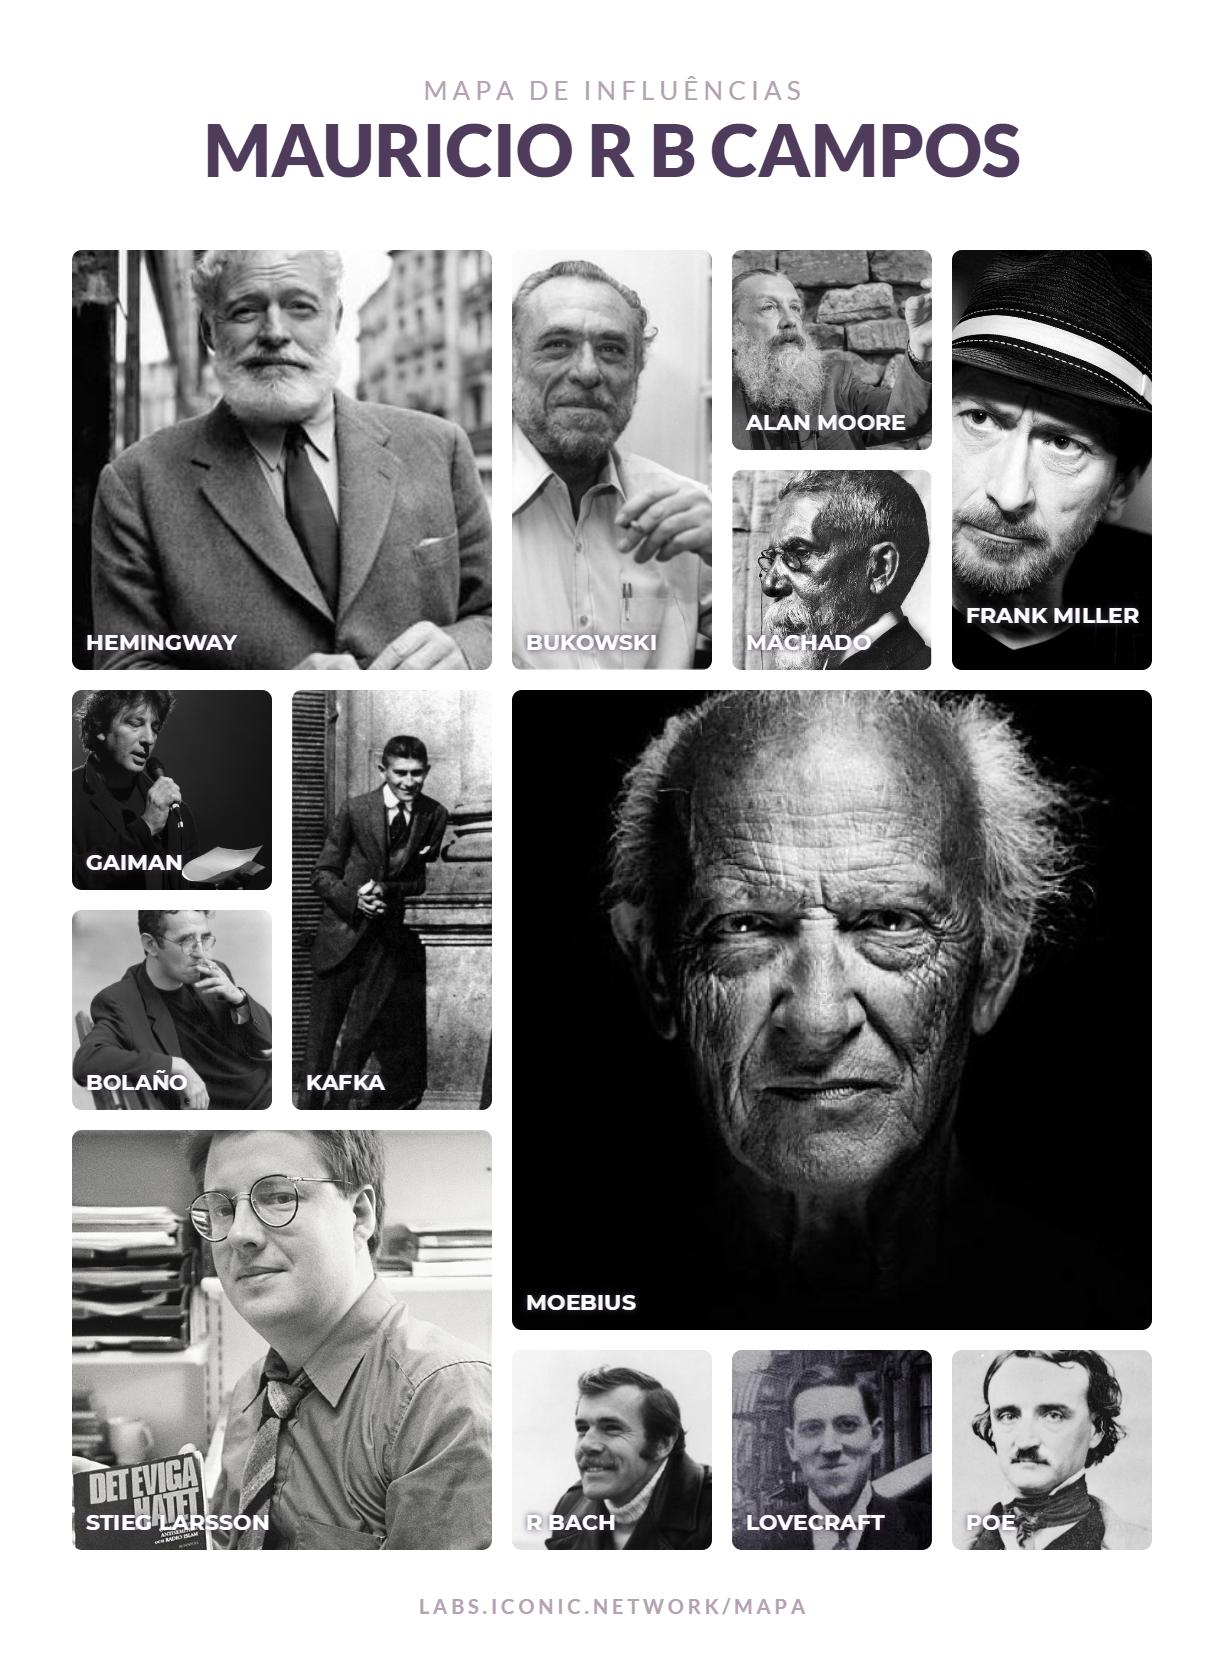 Mapa de Influências de Mauricio R B Campos com Hemingway, Bukowski, Machado, Frank Miller, Gaiman, Alan Moore, Bolaño, Kafka, Moebius, Stieg Larsson, Richard Bach, Lovecraft e Poe.